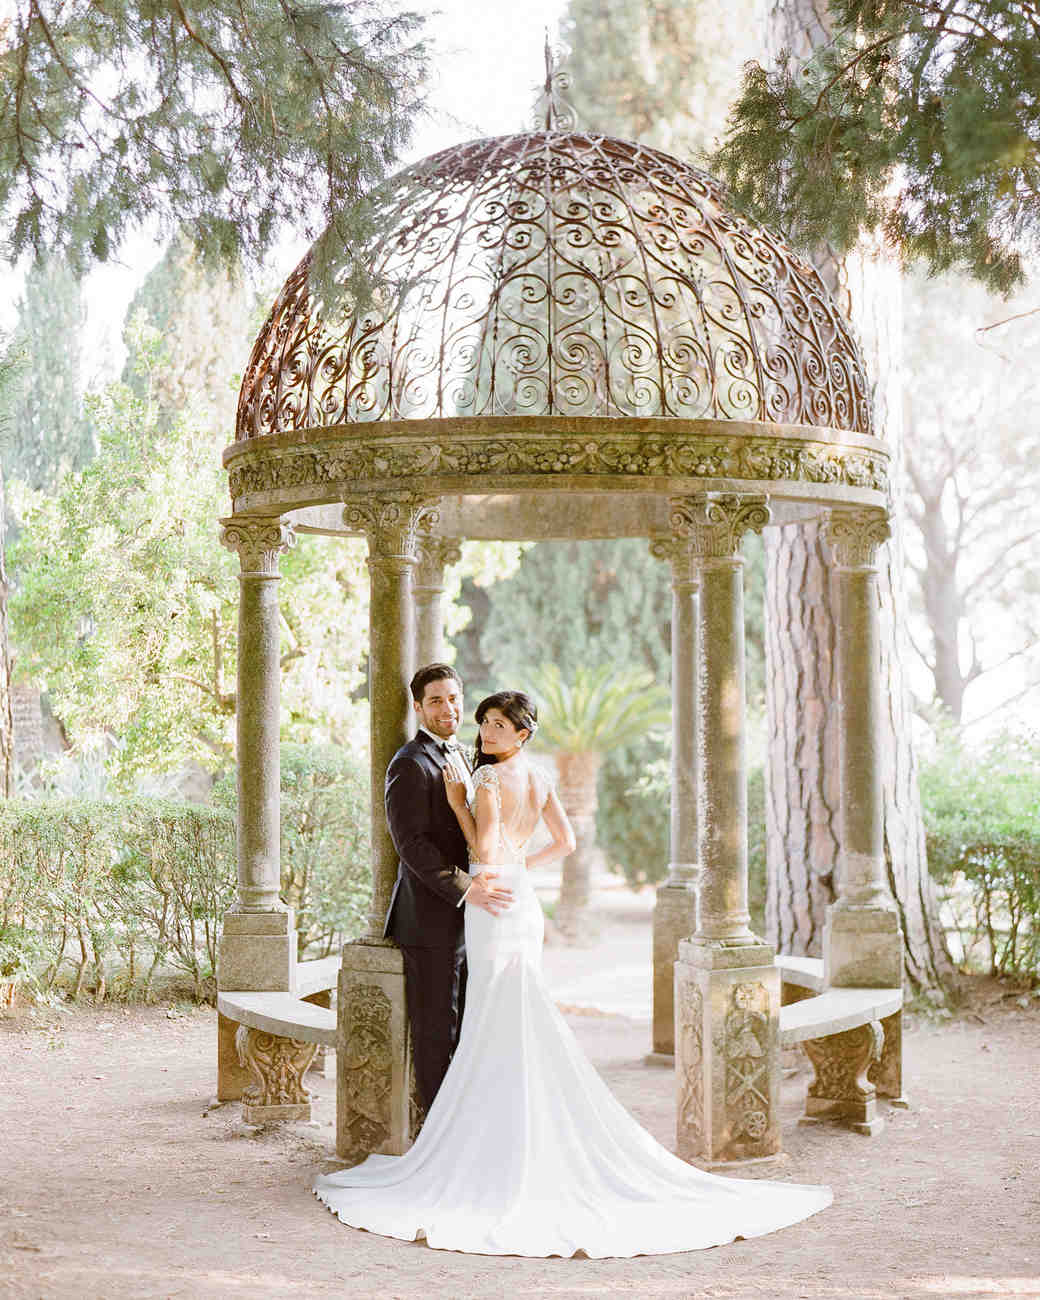 Italian Weddings: This Couple's Dreamy Italian Destination Wedding Could